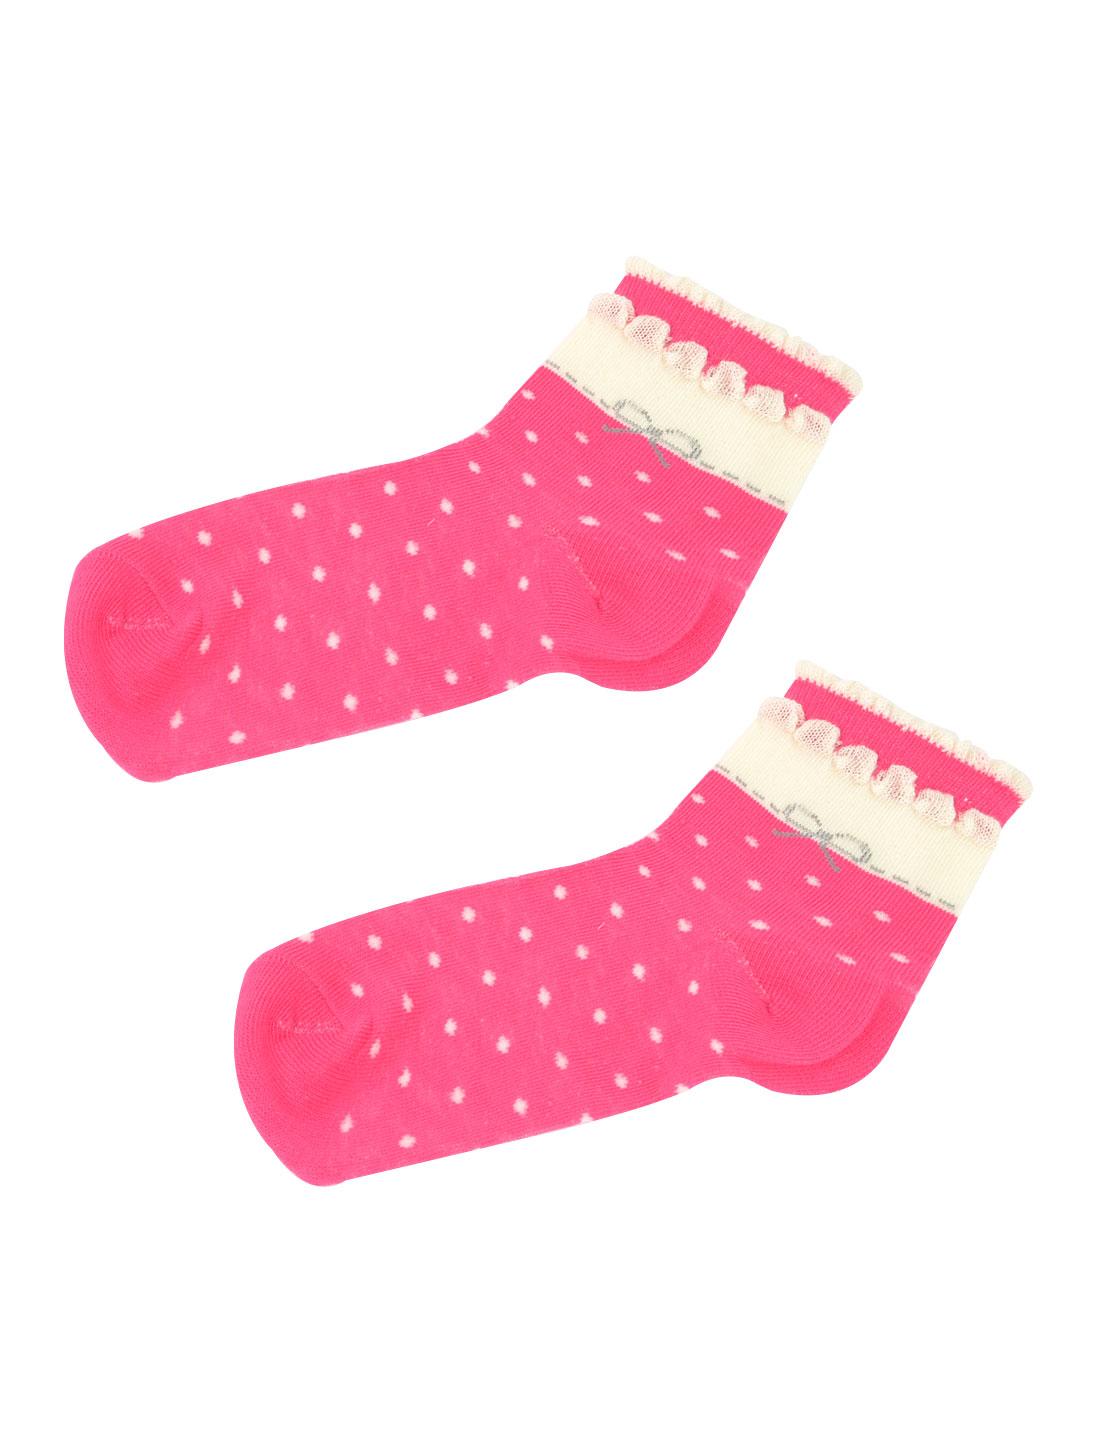 Woman Fuchsia White Elastic Cuff Polka Dot Print Crew Ankle Socks Hosiery Pair